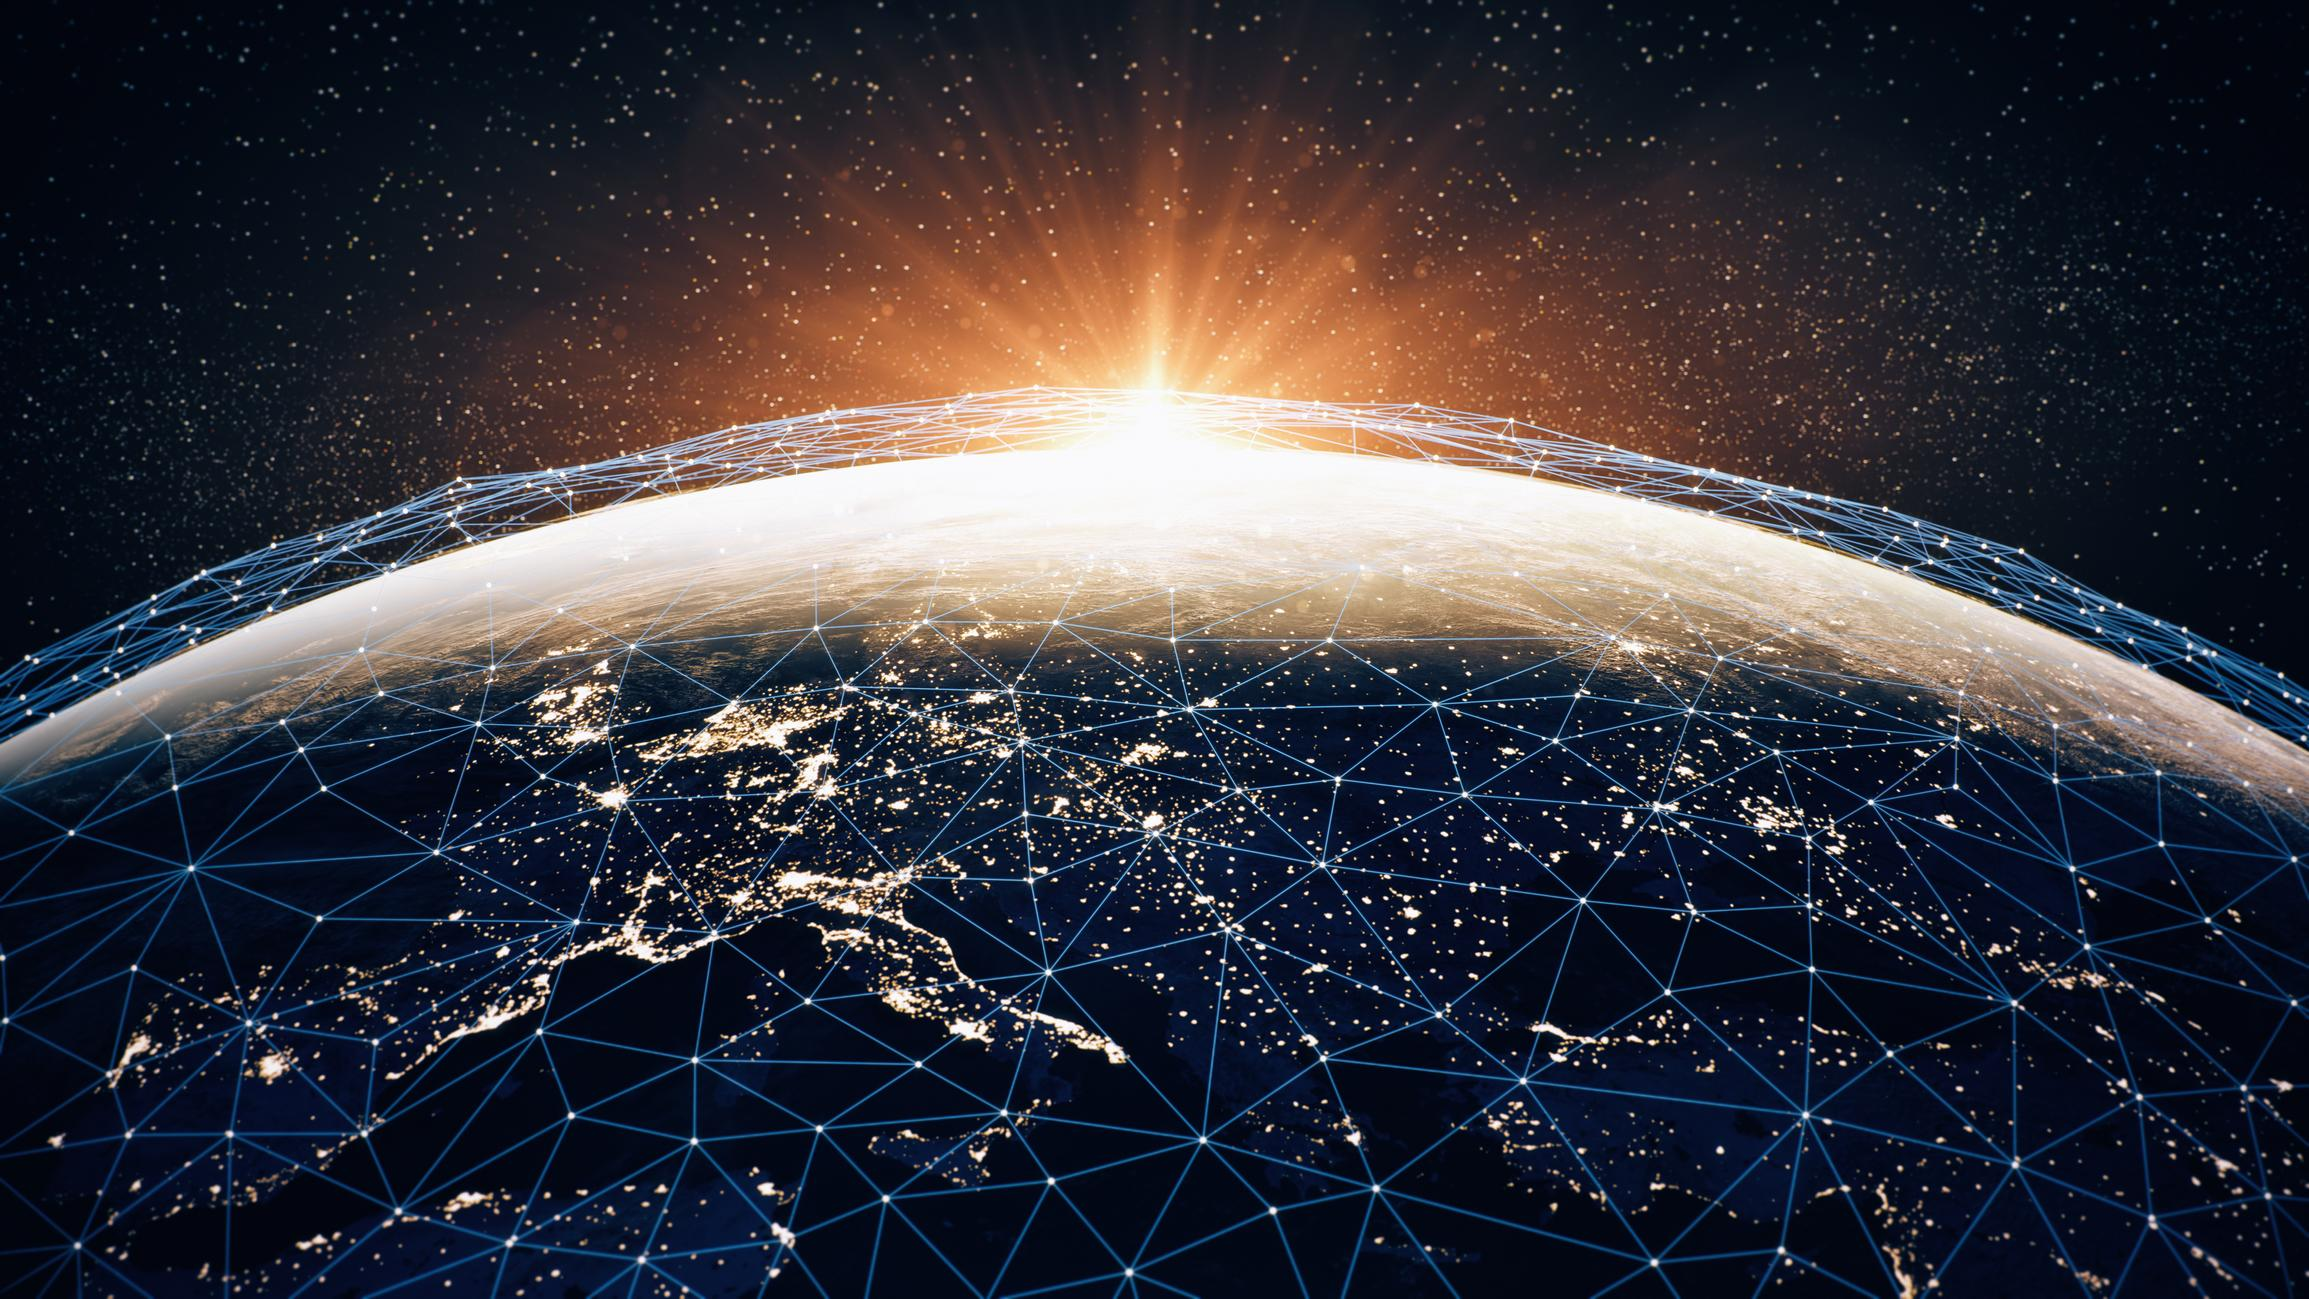 Global Communication Network (World Map Credits To NASA)